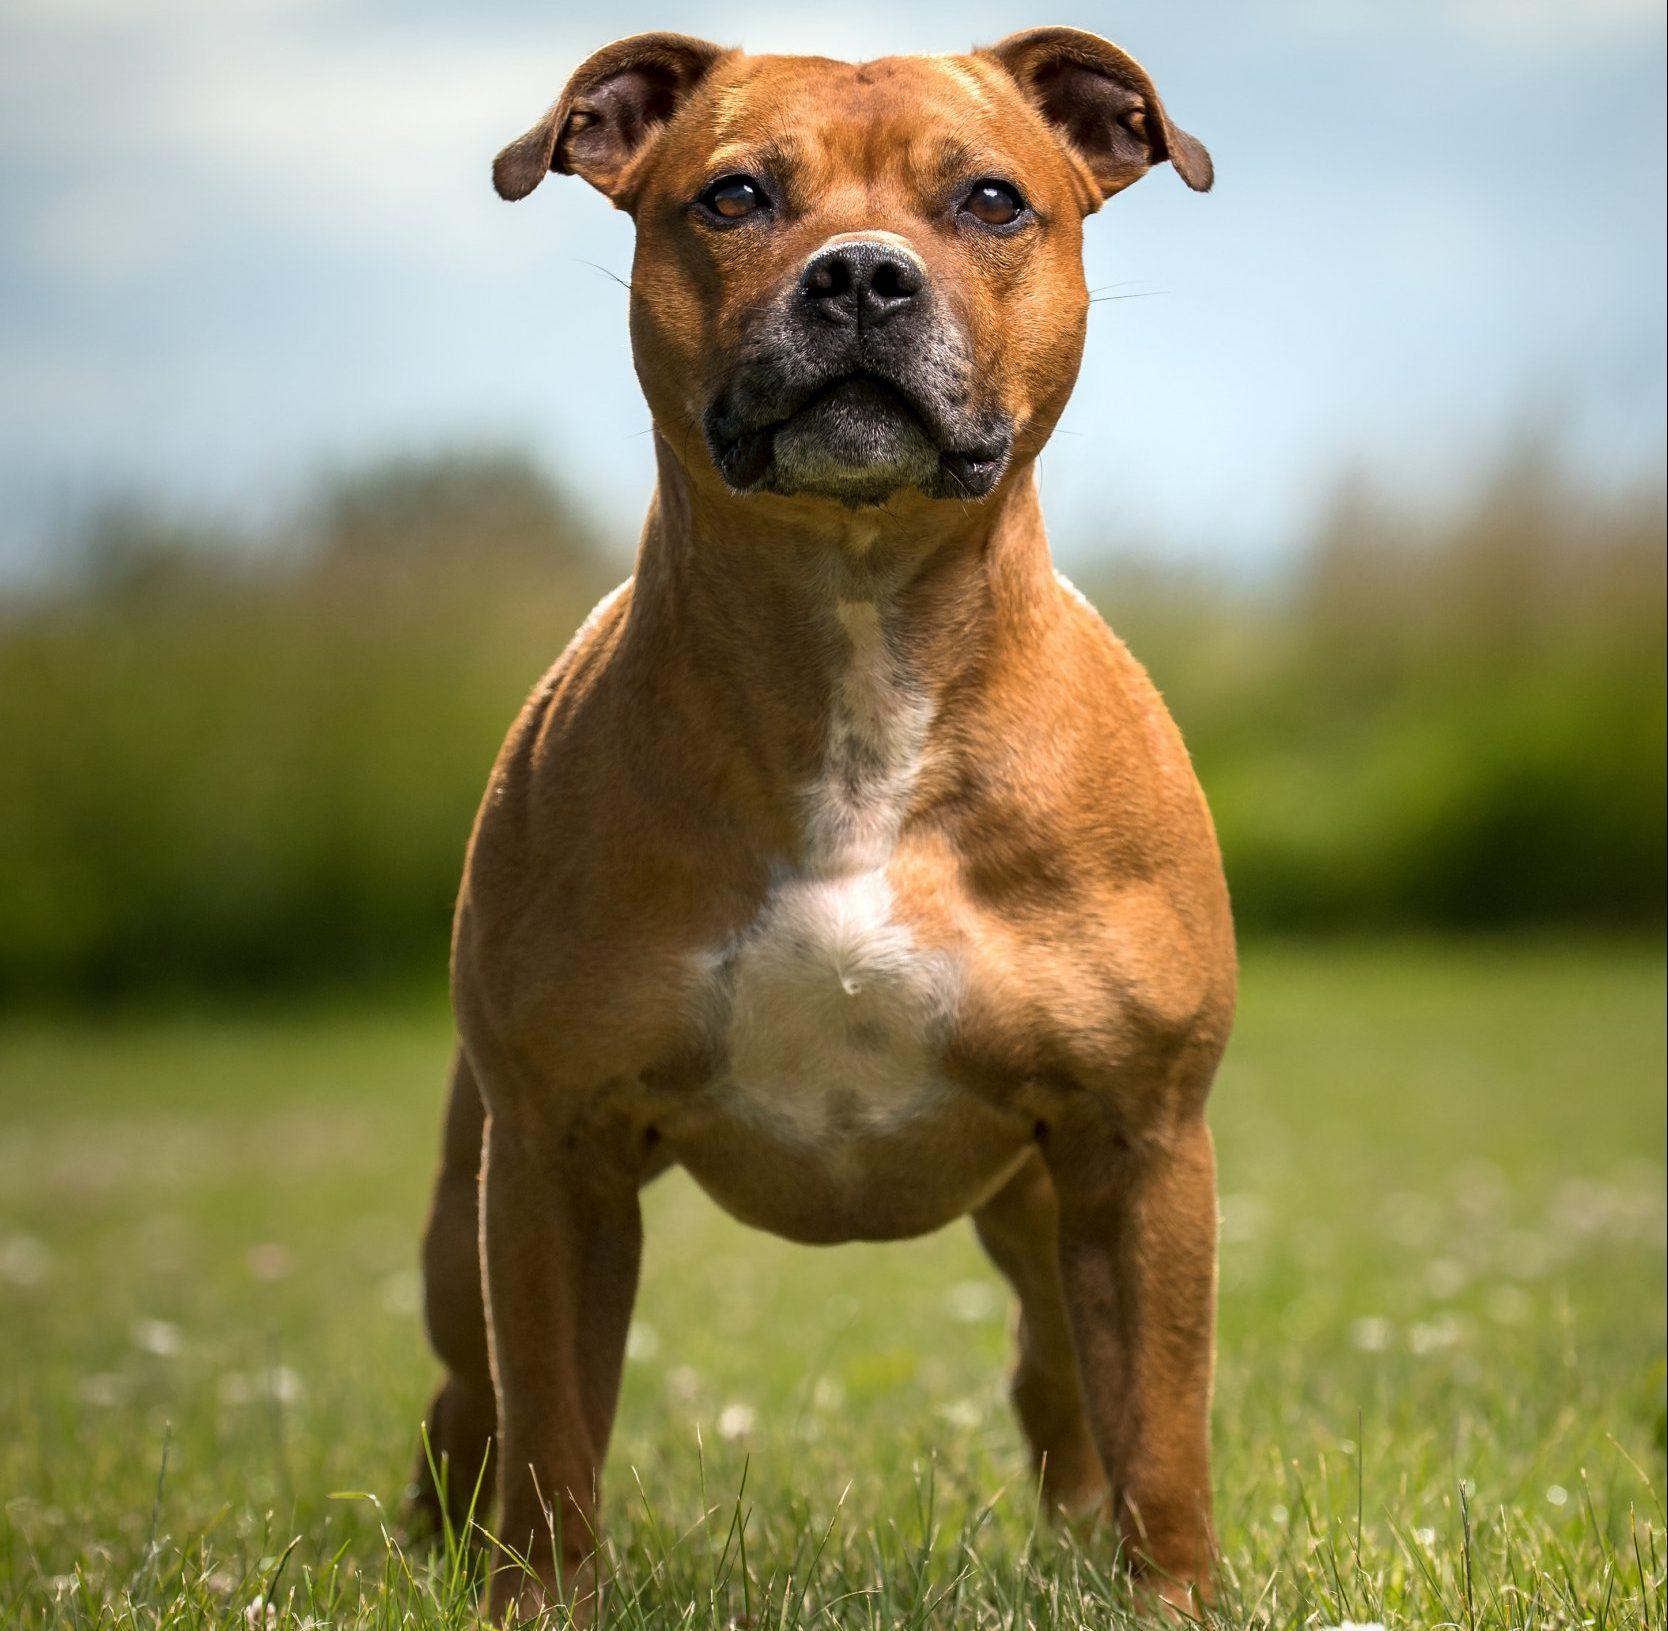 Staffordshire Bull Terrier.; Shutterstock ID 782056438; Purchase Order: -